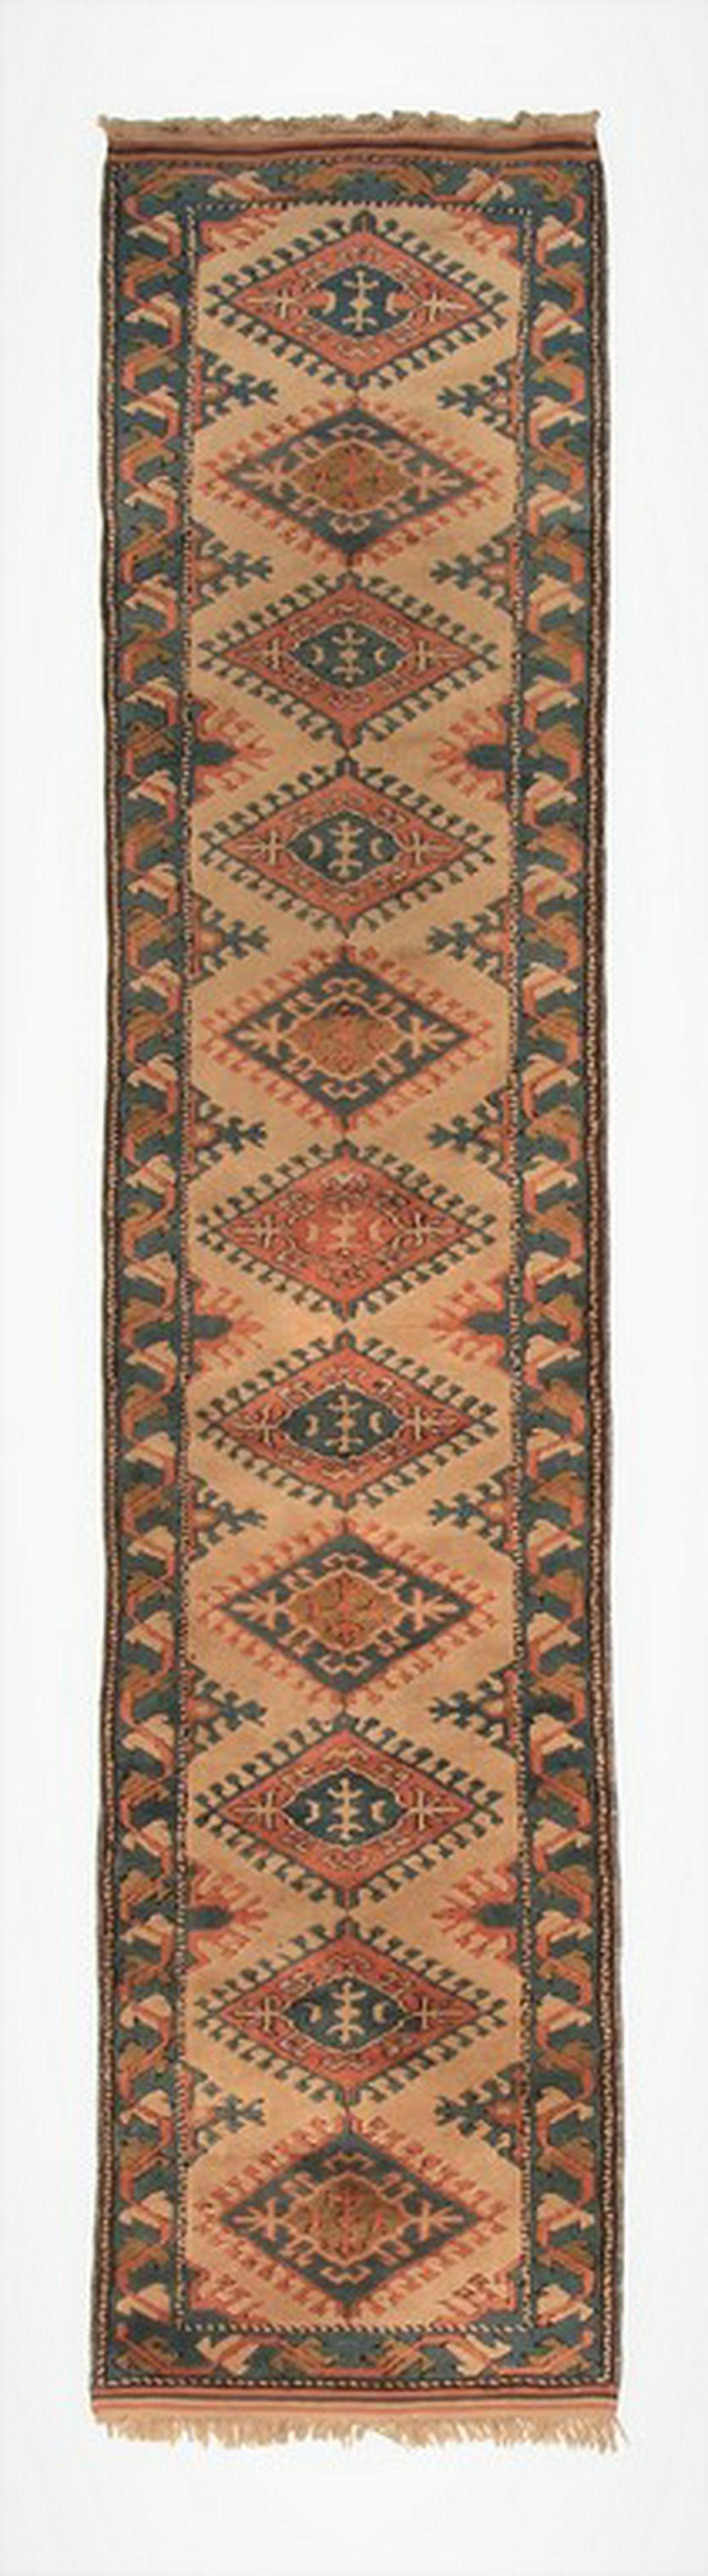 Vintage Turkish Oushak Runner Rug Geometric Carpet